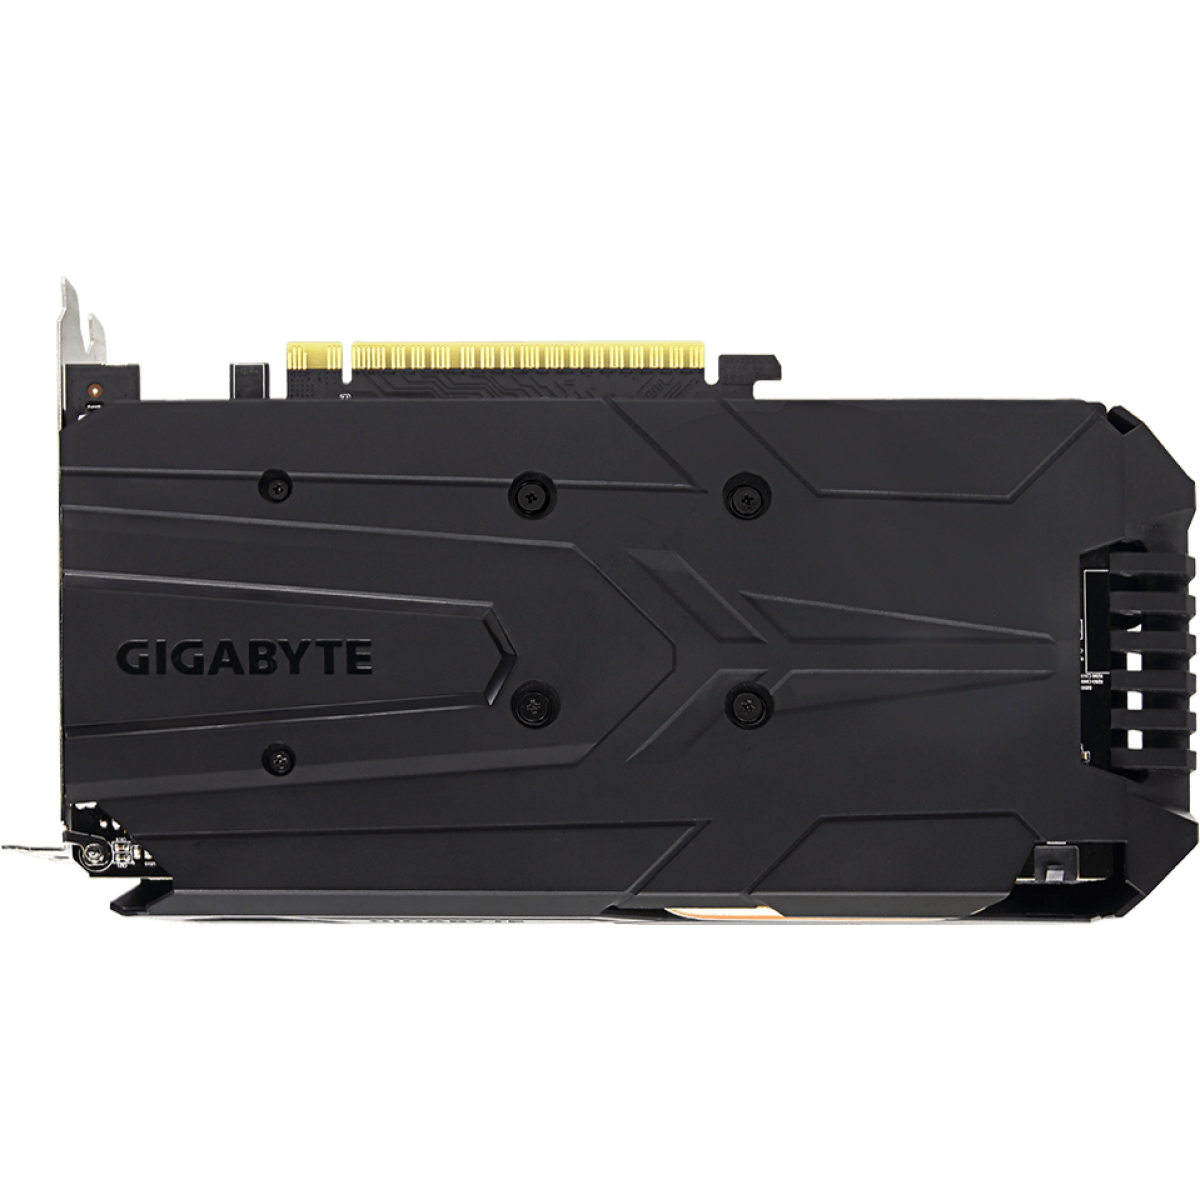 Placa de Vídeo Gigabyte GeForce GTX 1050 Ti Windforce OC Dual, 4GB GDDR5, 128Bit, GV-N105TWF2OC-4GD